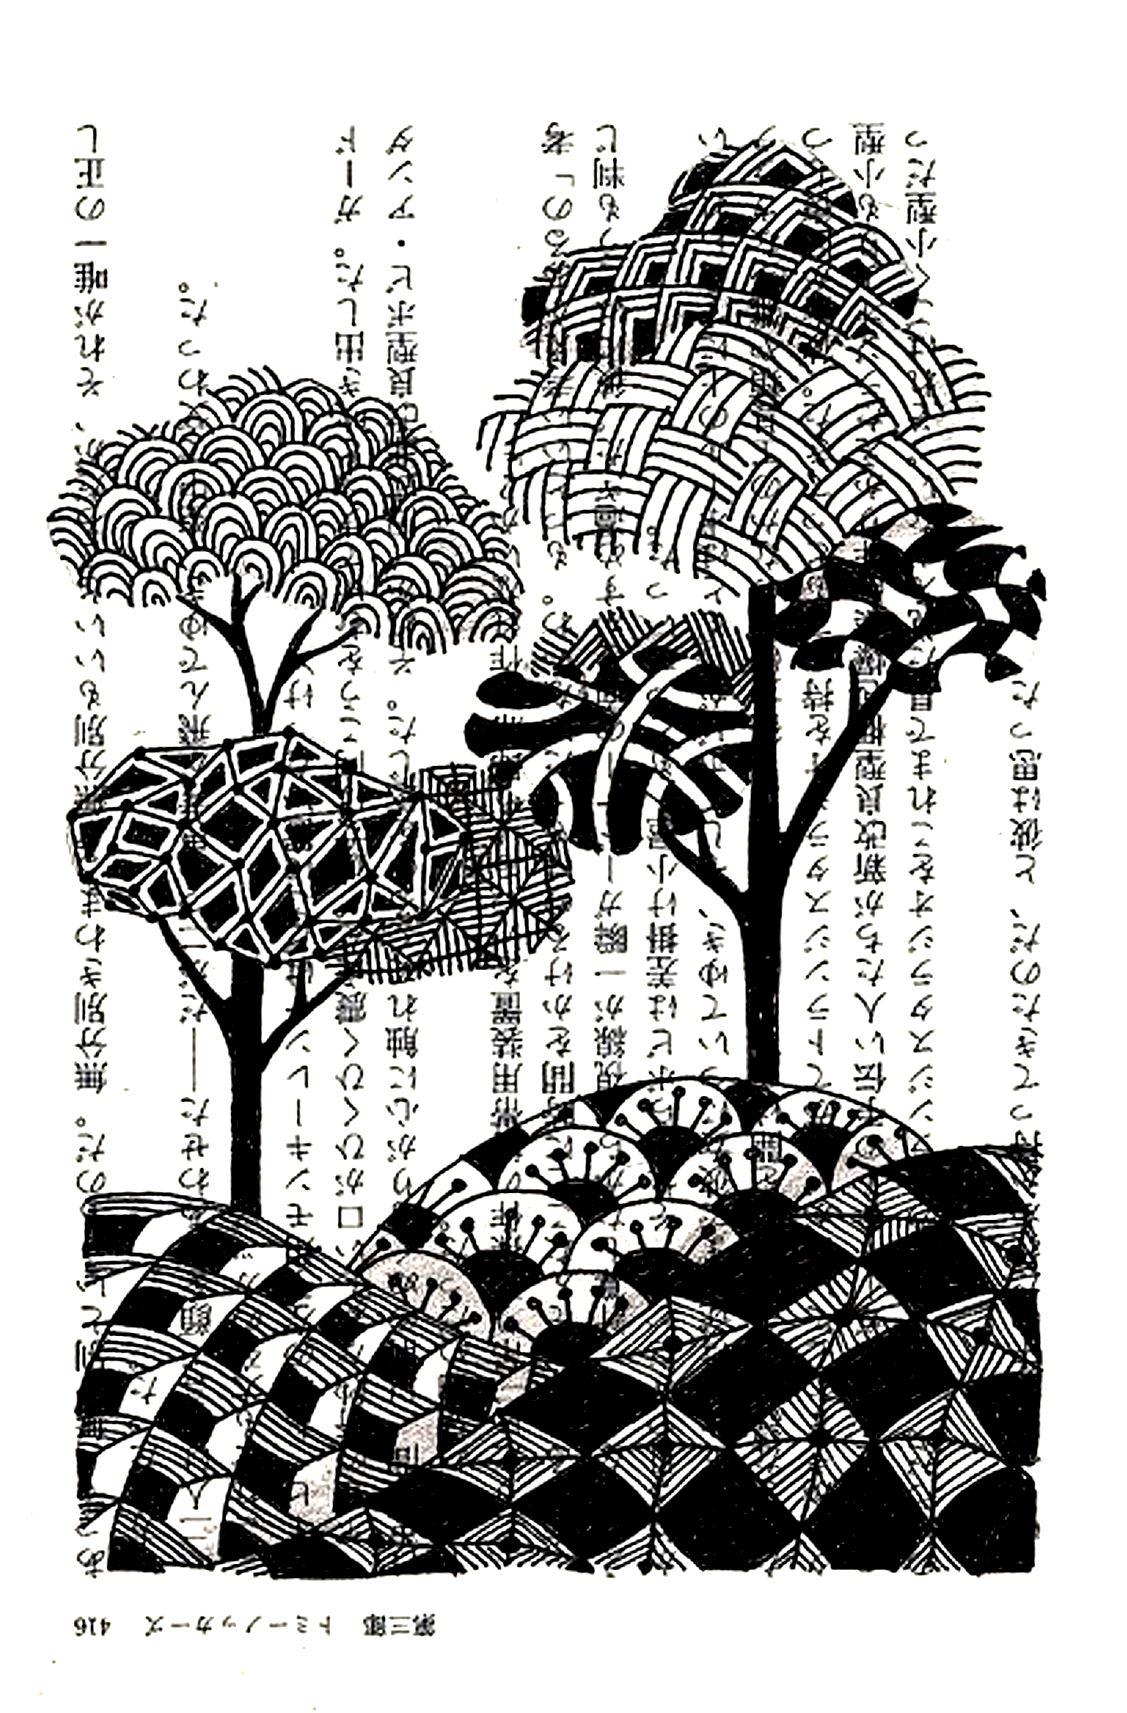 dessin style chinois arbres encre de chine chine asie coloriages difficiles pour adultes. Black Bedroom Furniture Sets. Home Design Ideas